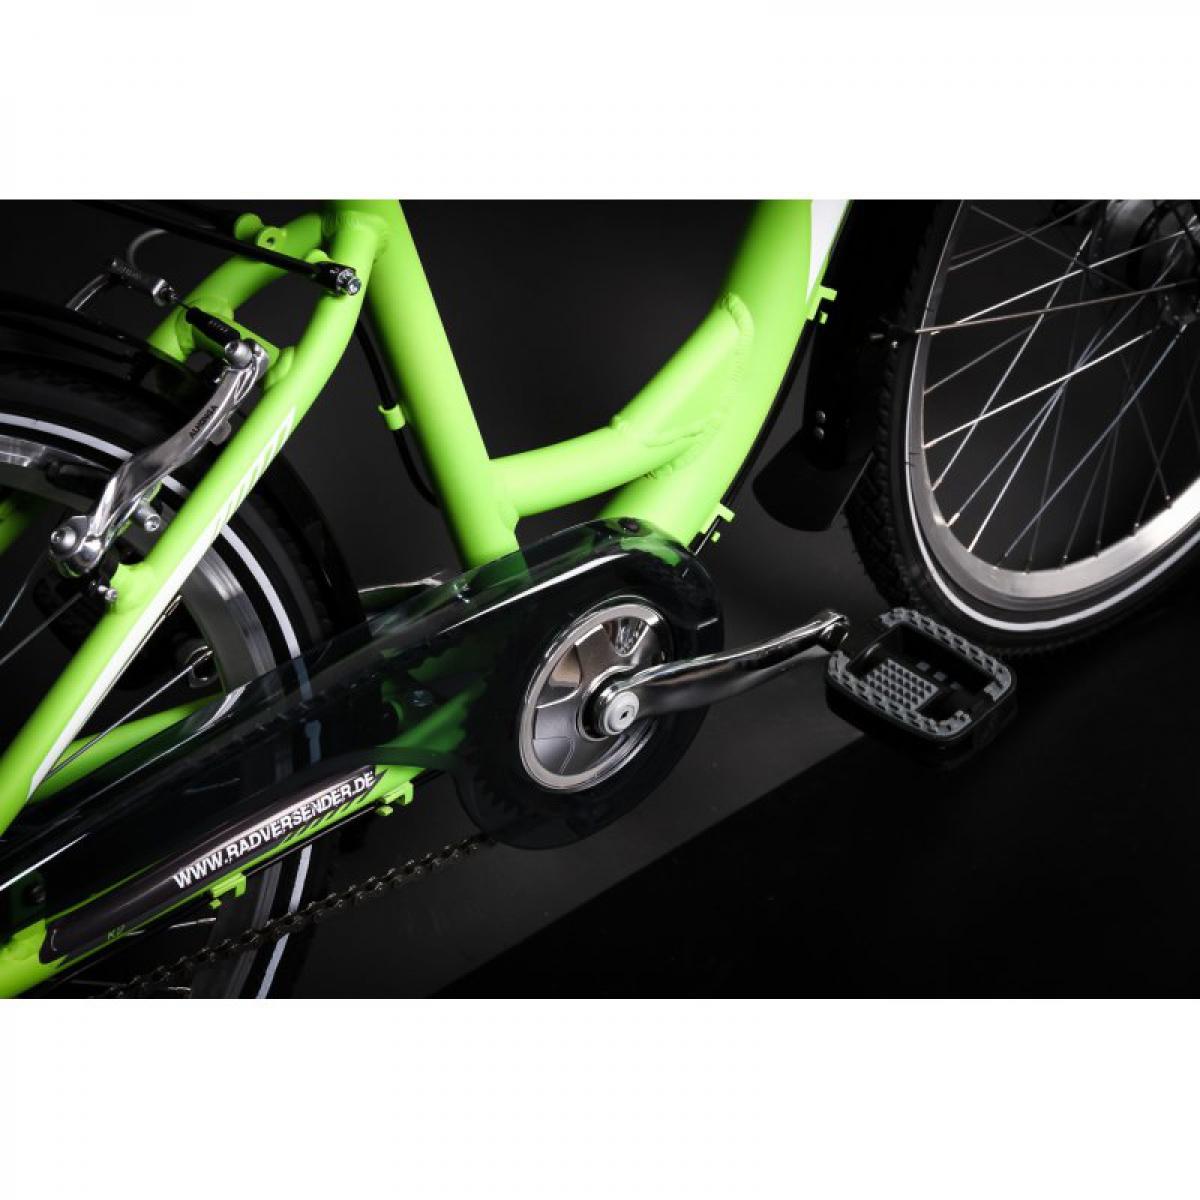 24 zoll alu m dchen fahrrad city bike shimano nexus 3. Black Bedroom Furniture Sets. Home Design Ideas